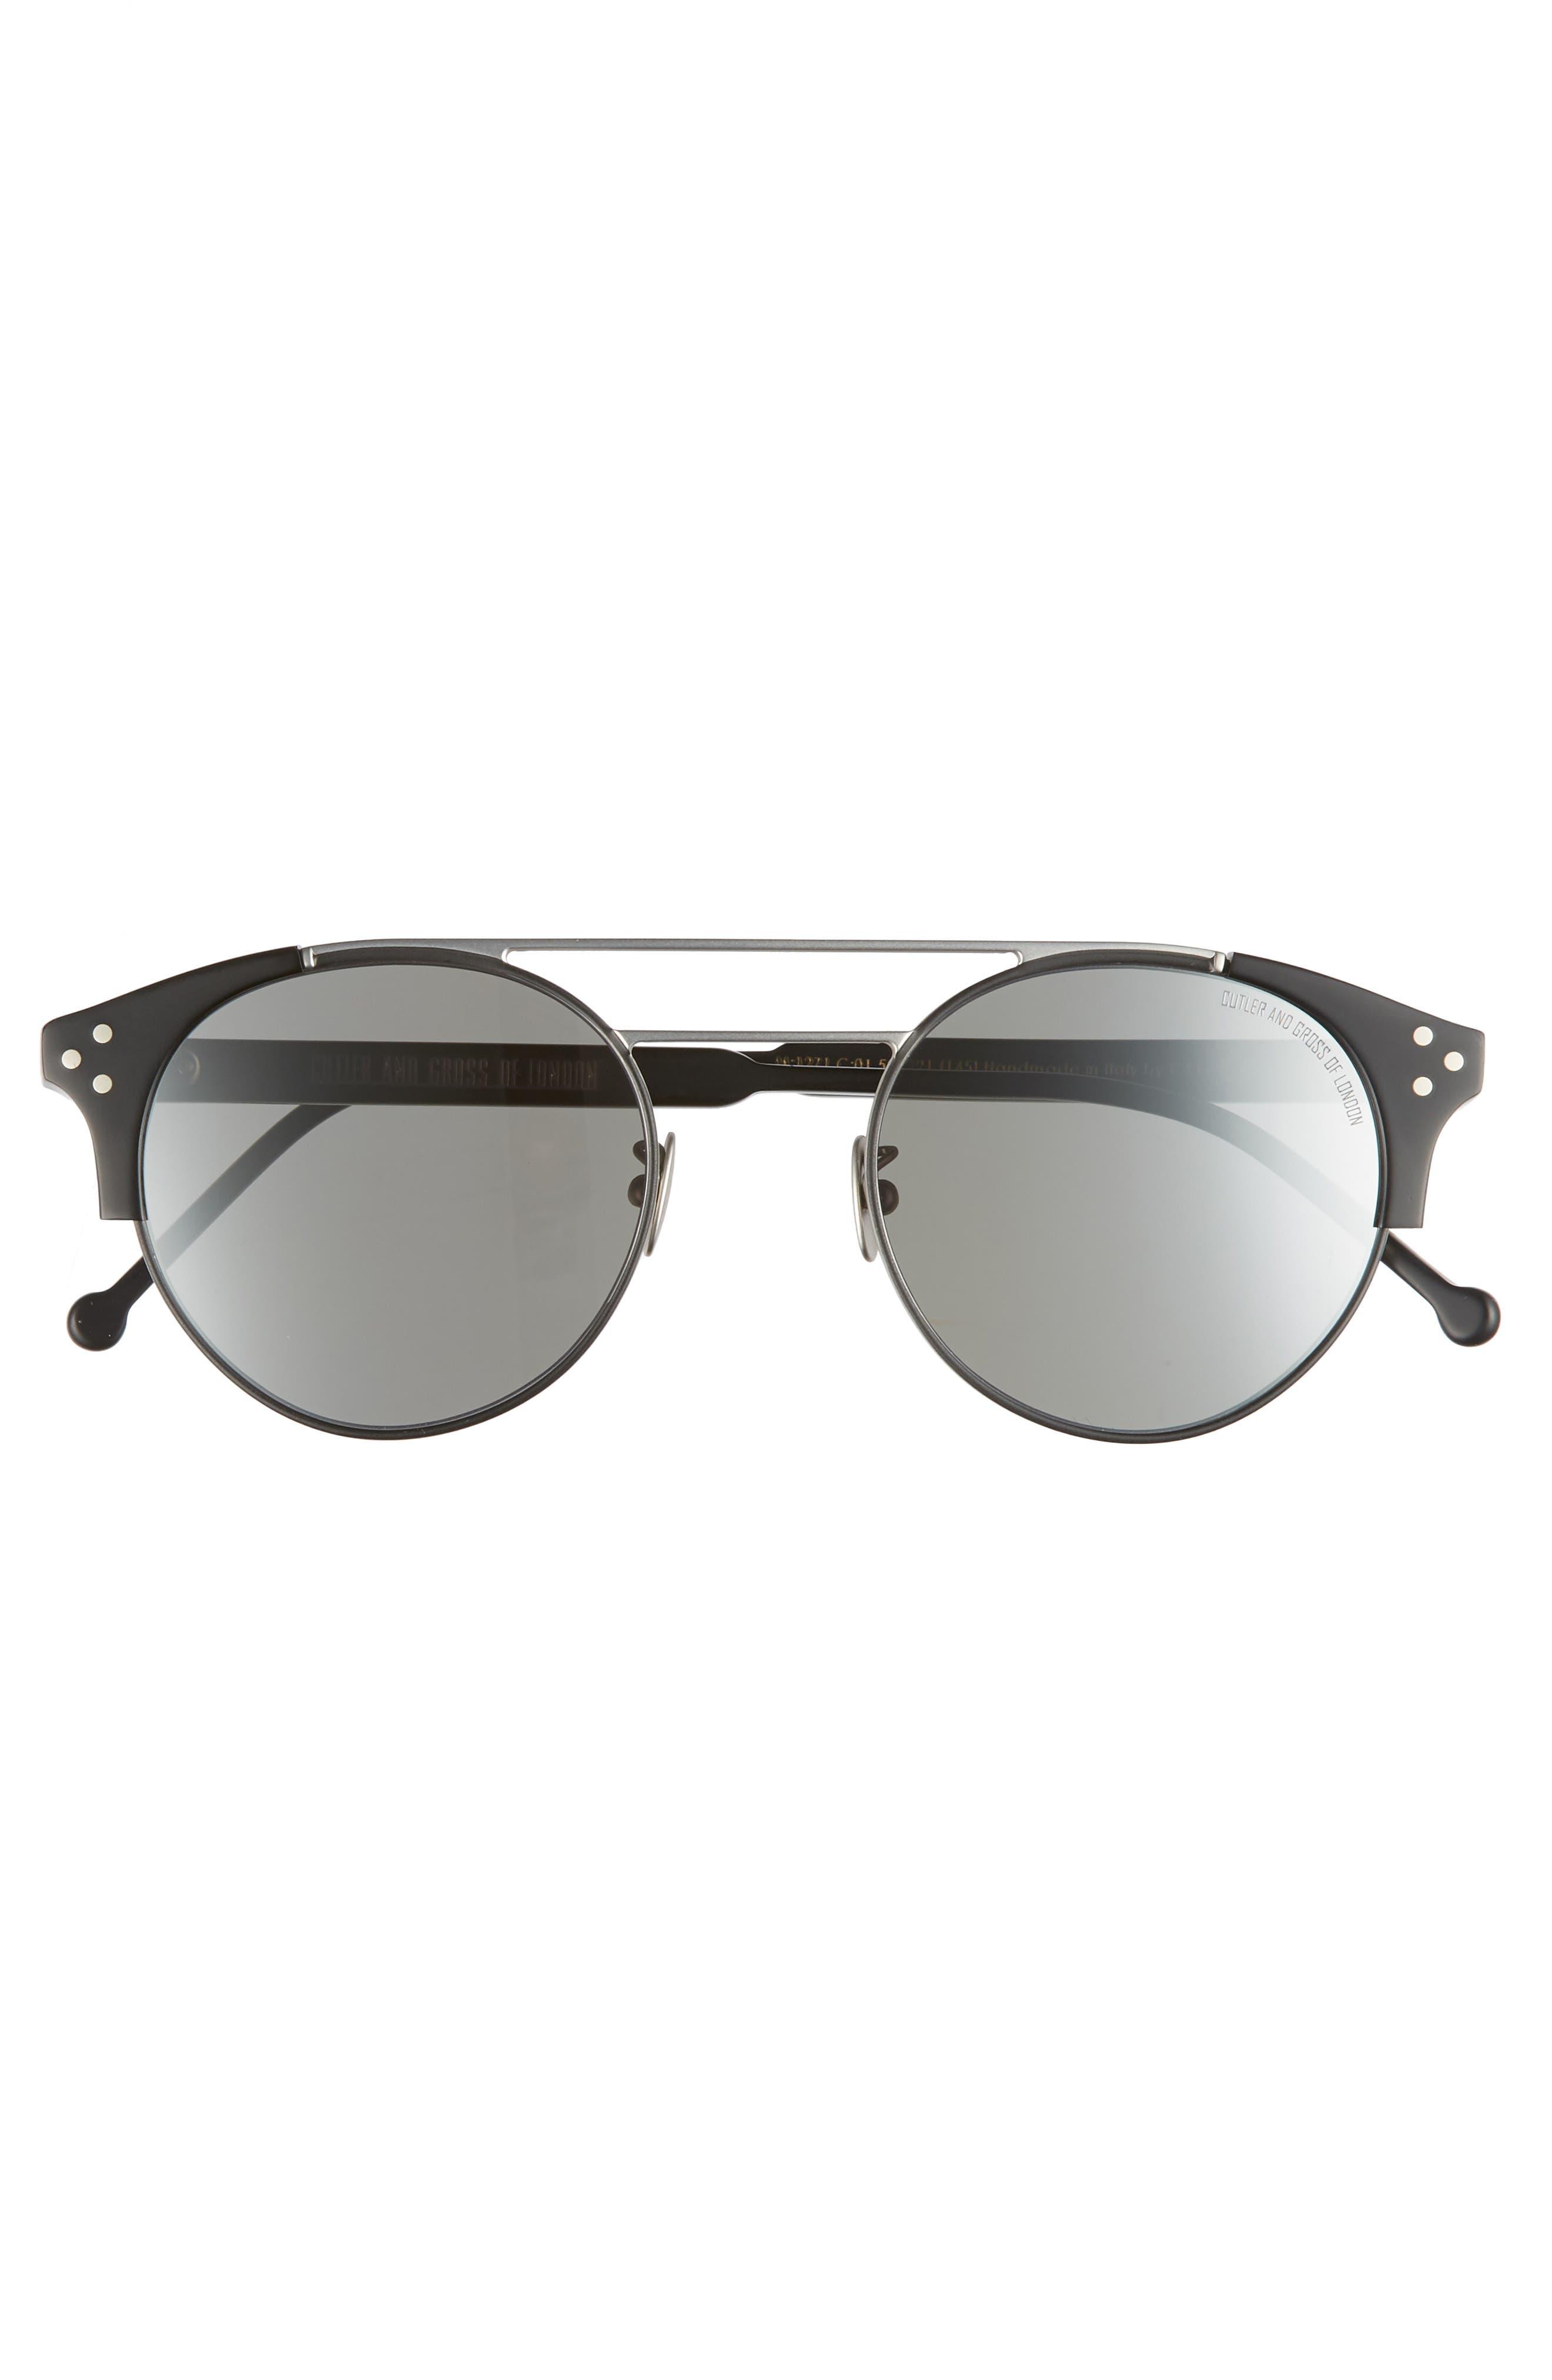 50mm Polarized Round Sunglasses,                             Alternate thumbnail 2, color,                             PALLADIUM AND BLACK/ SILVER